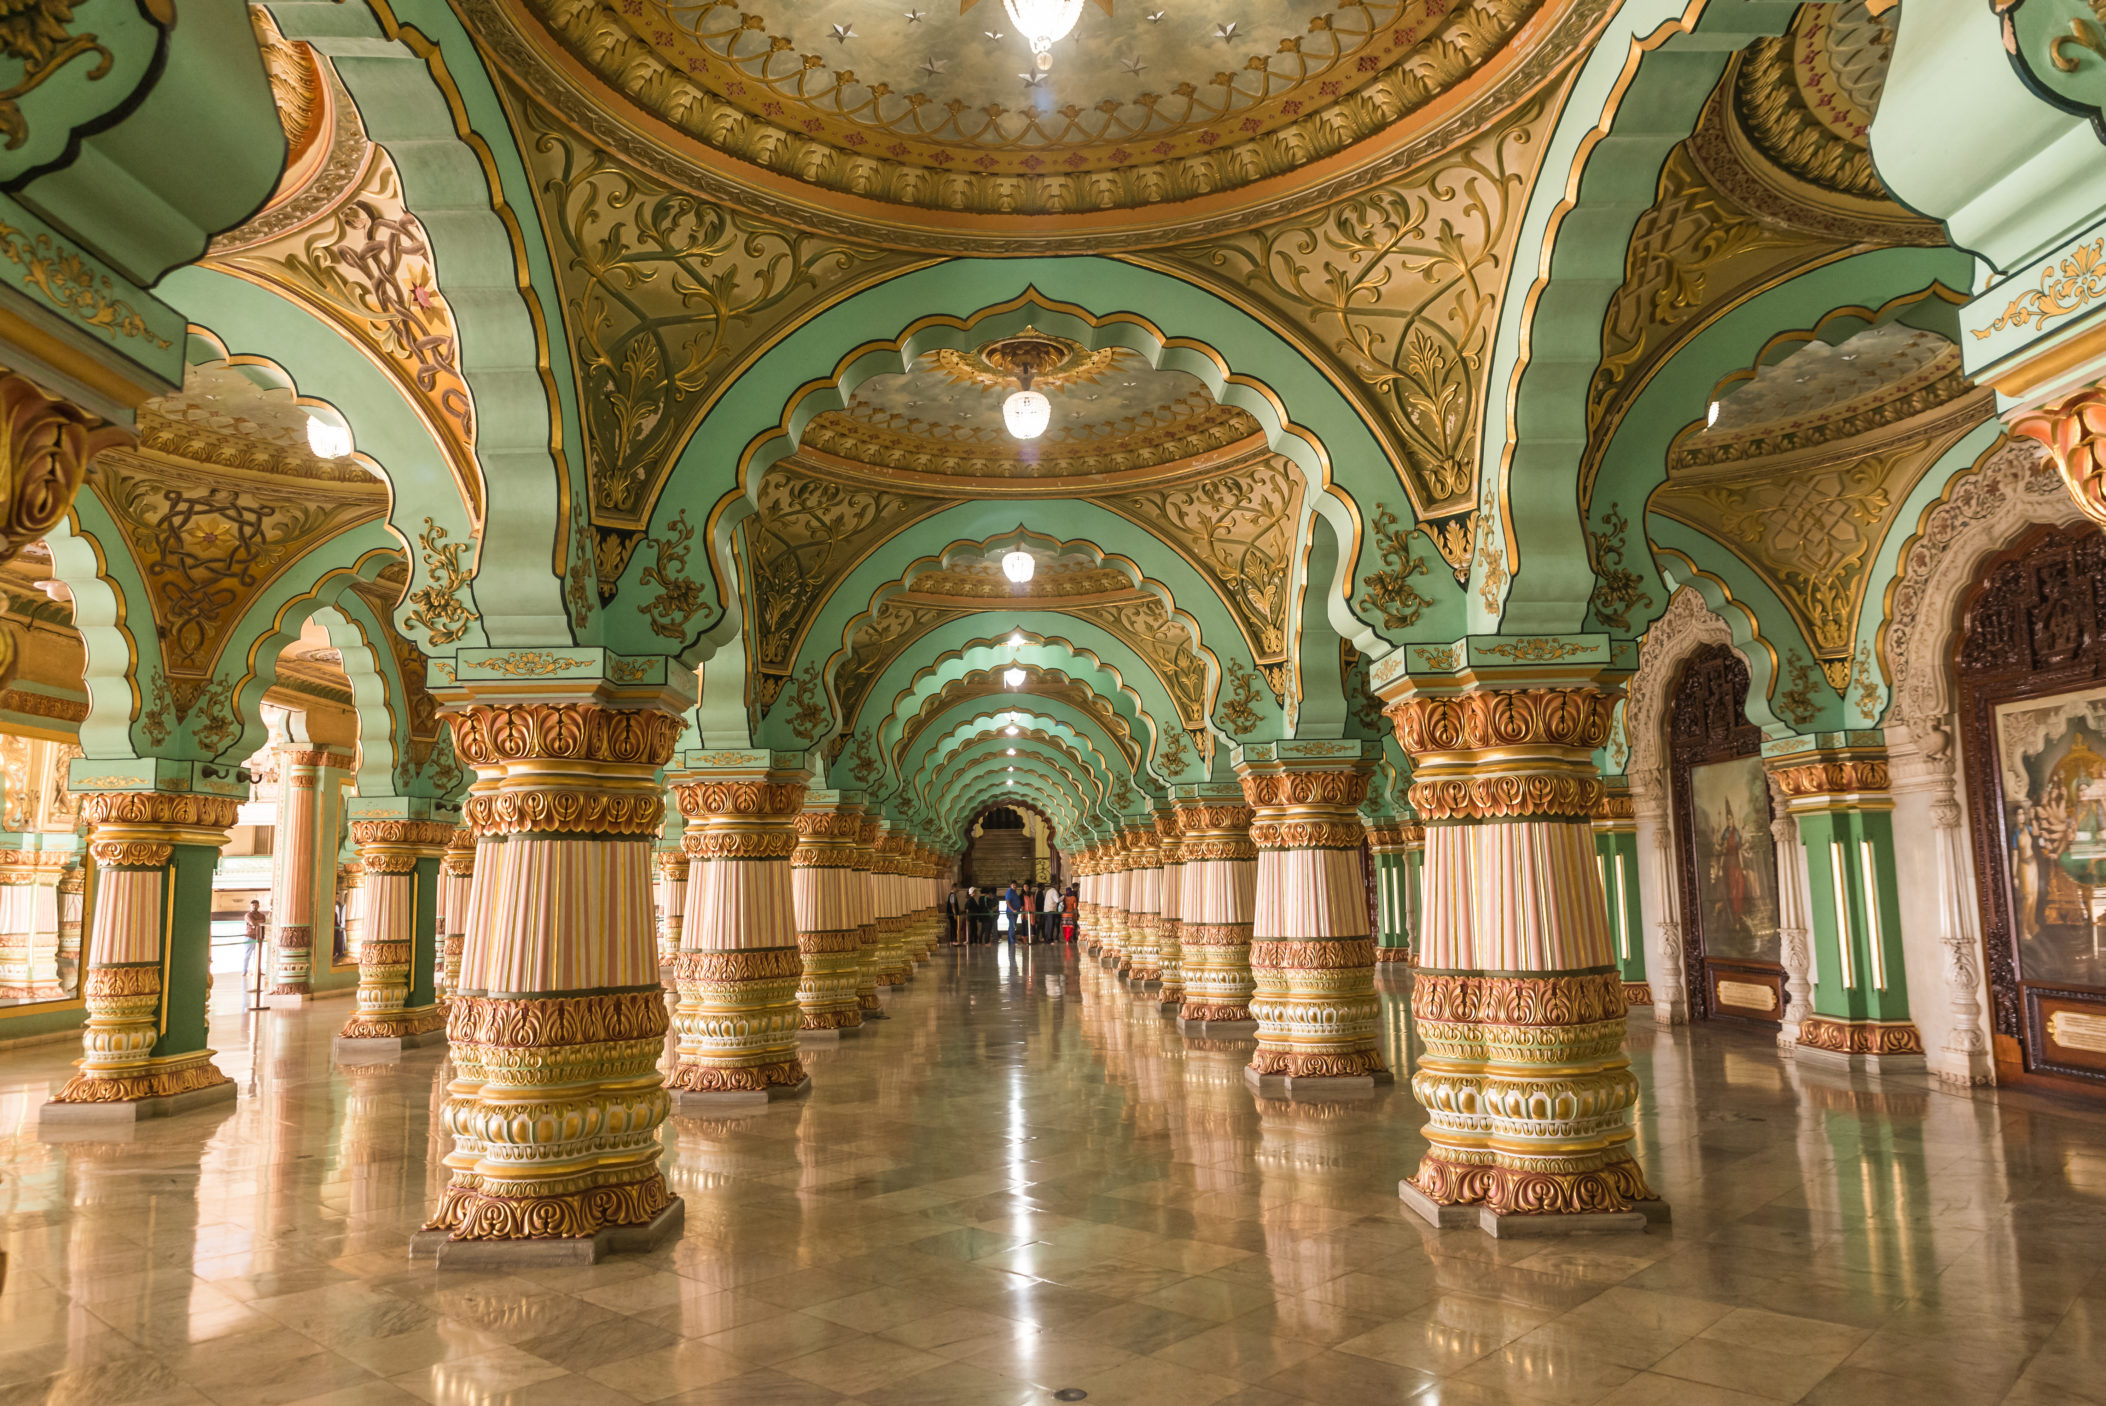 India [Shutterstock]